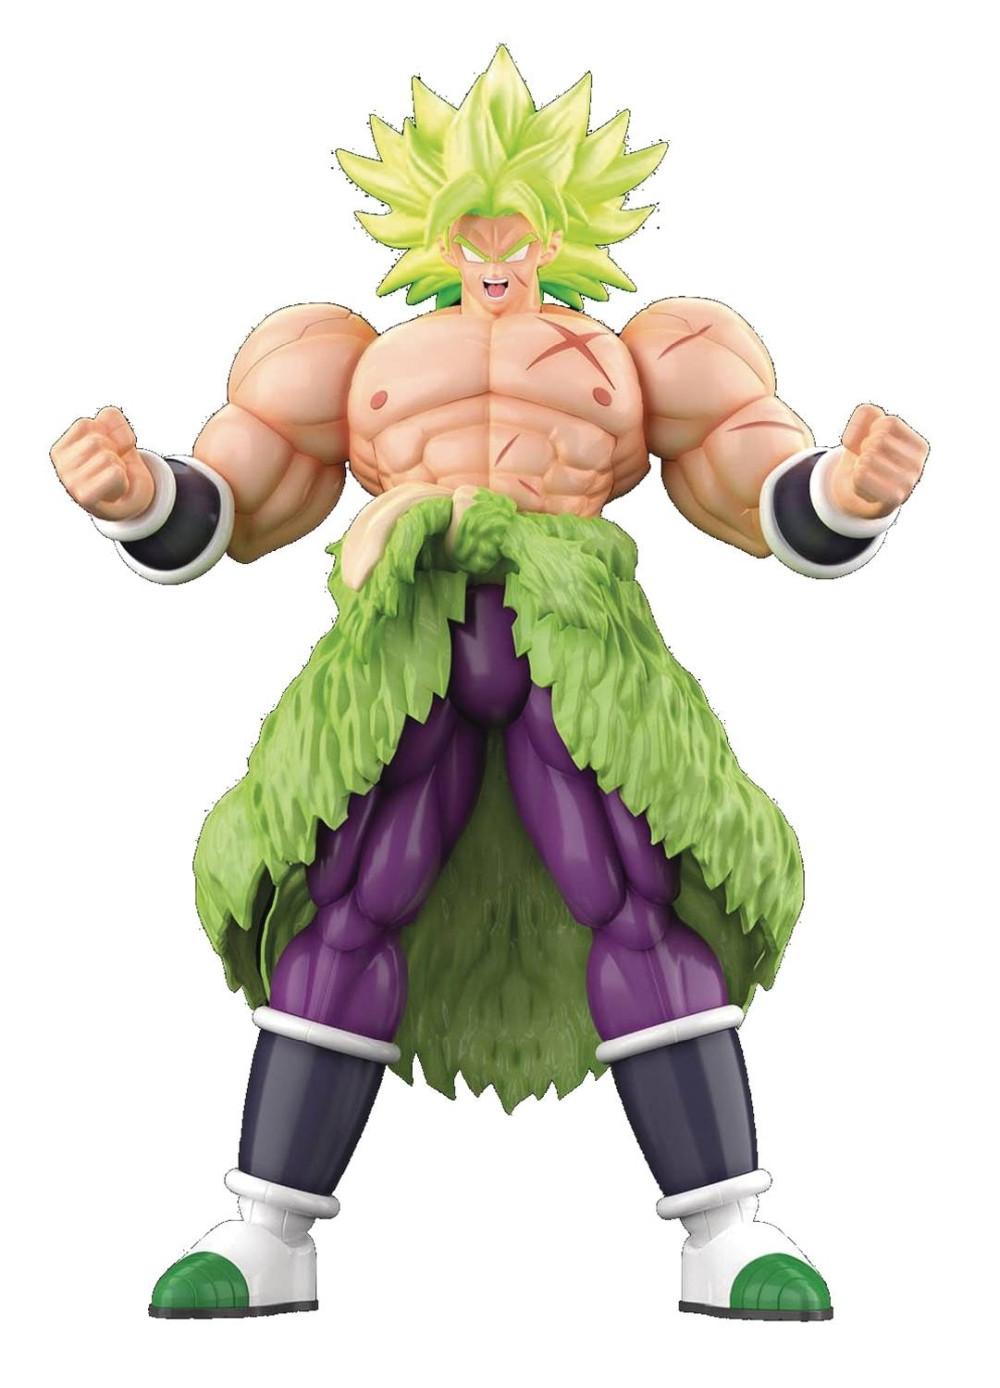 Dragonball Super - Super Saiyan Full Power Broly Chokoku Buyuden 23cm Figur